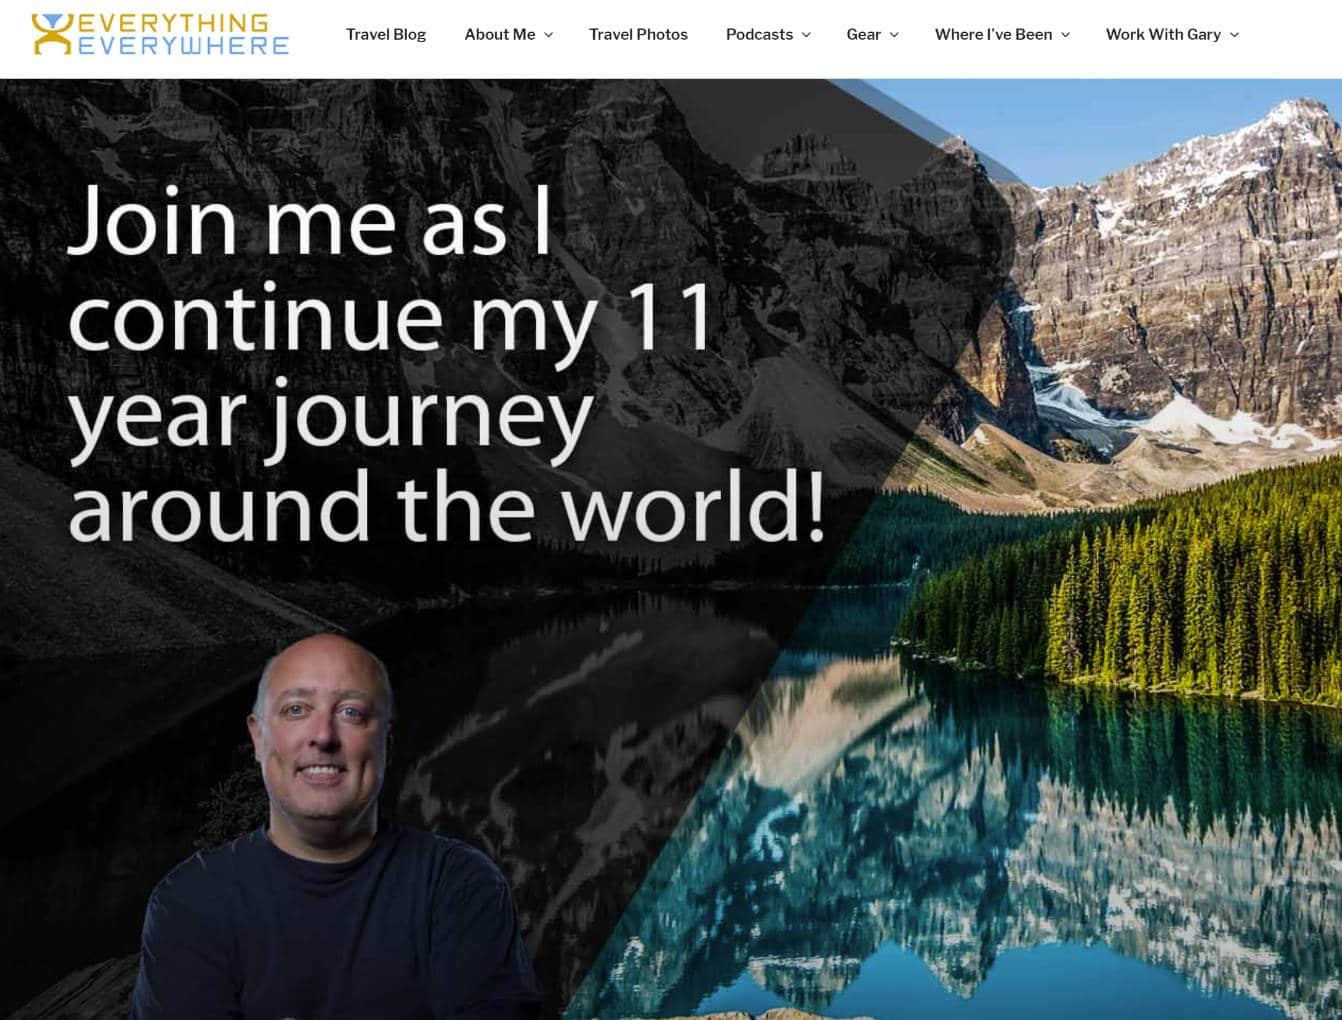 Travel blog alrededor del mundo